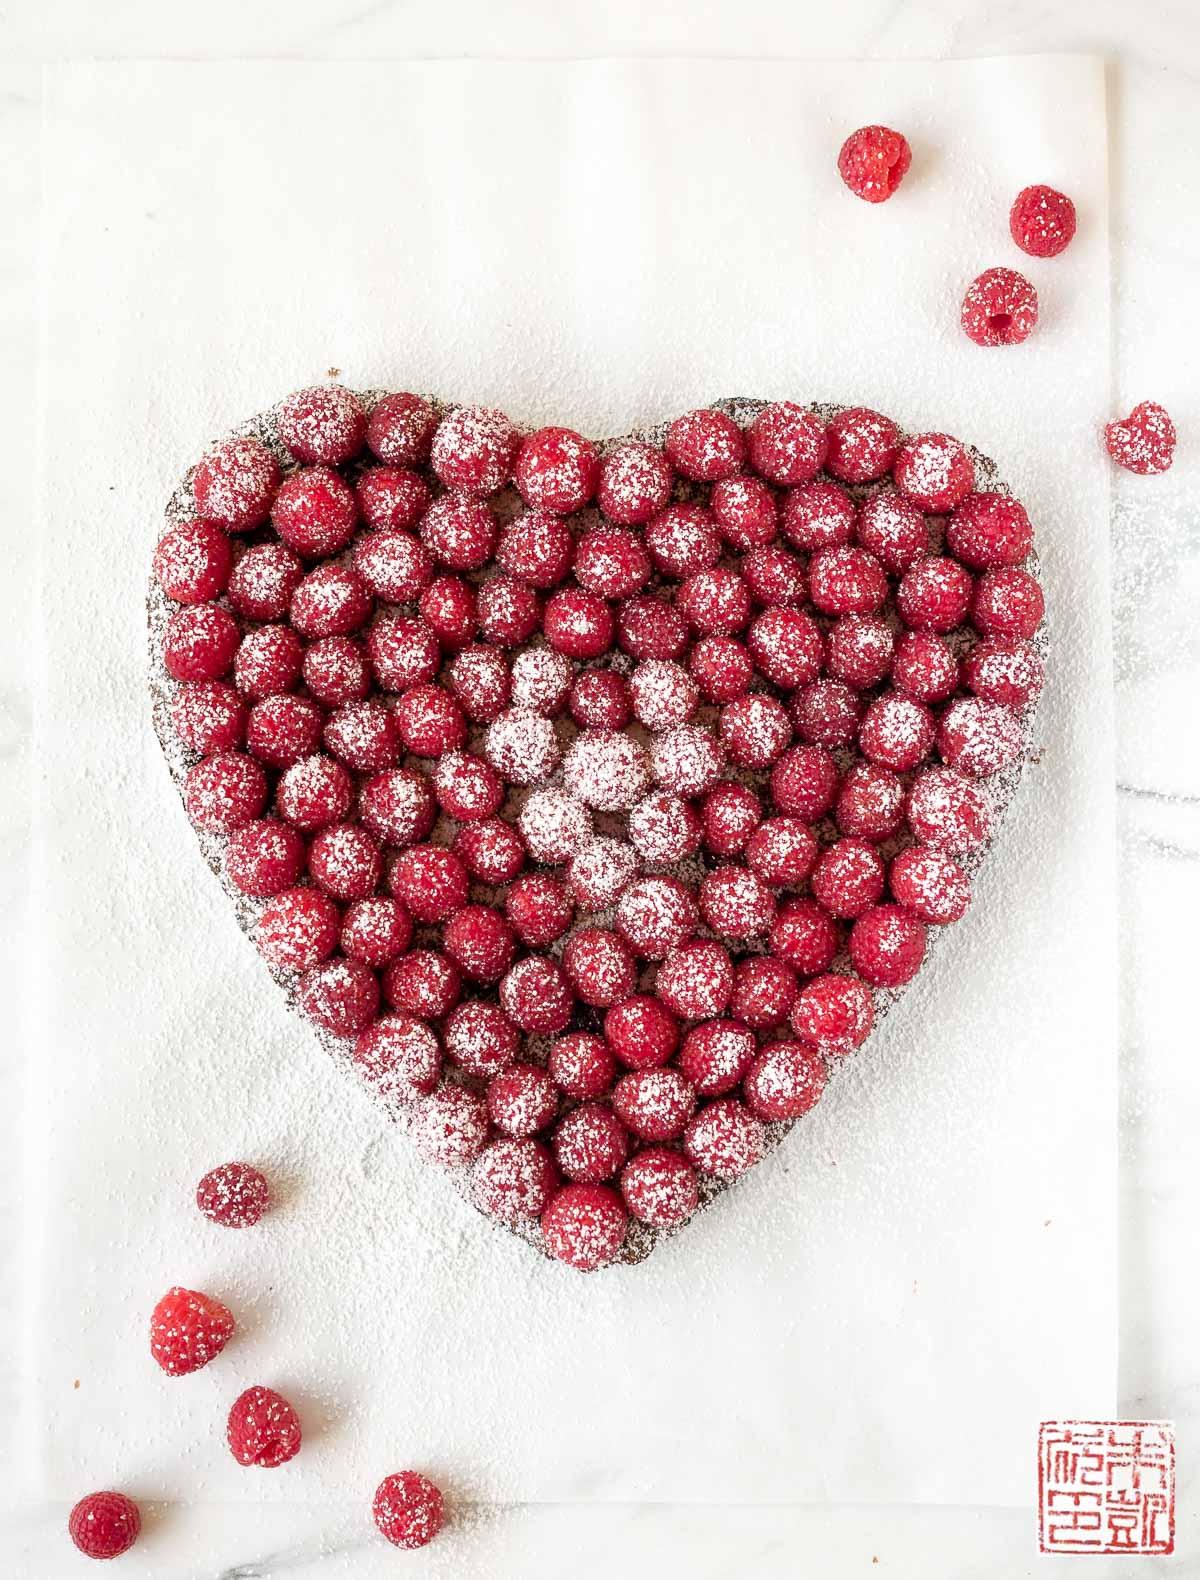 raspberry-heart-brownie